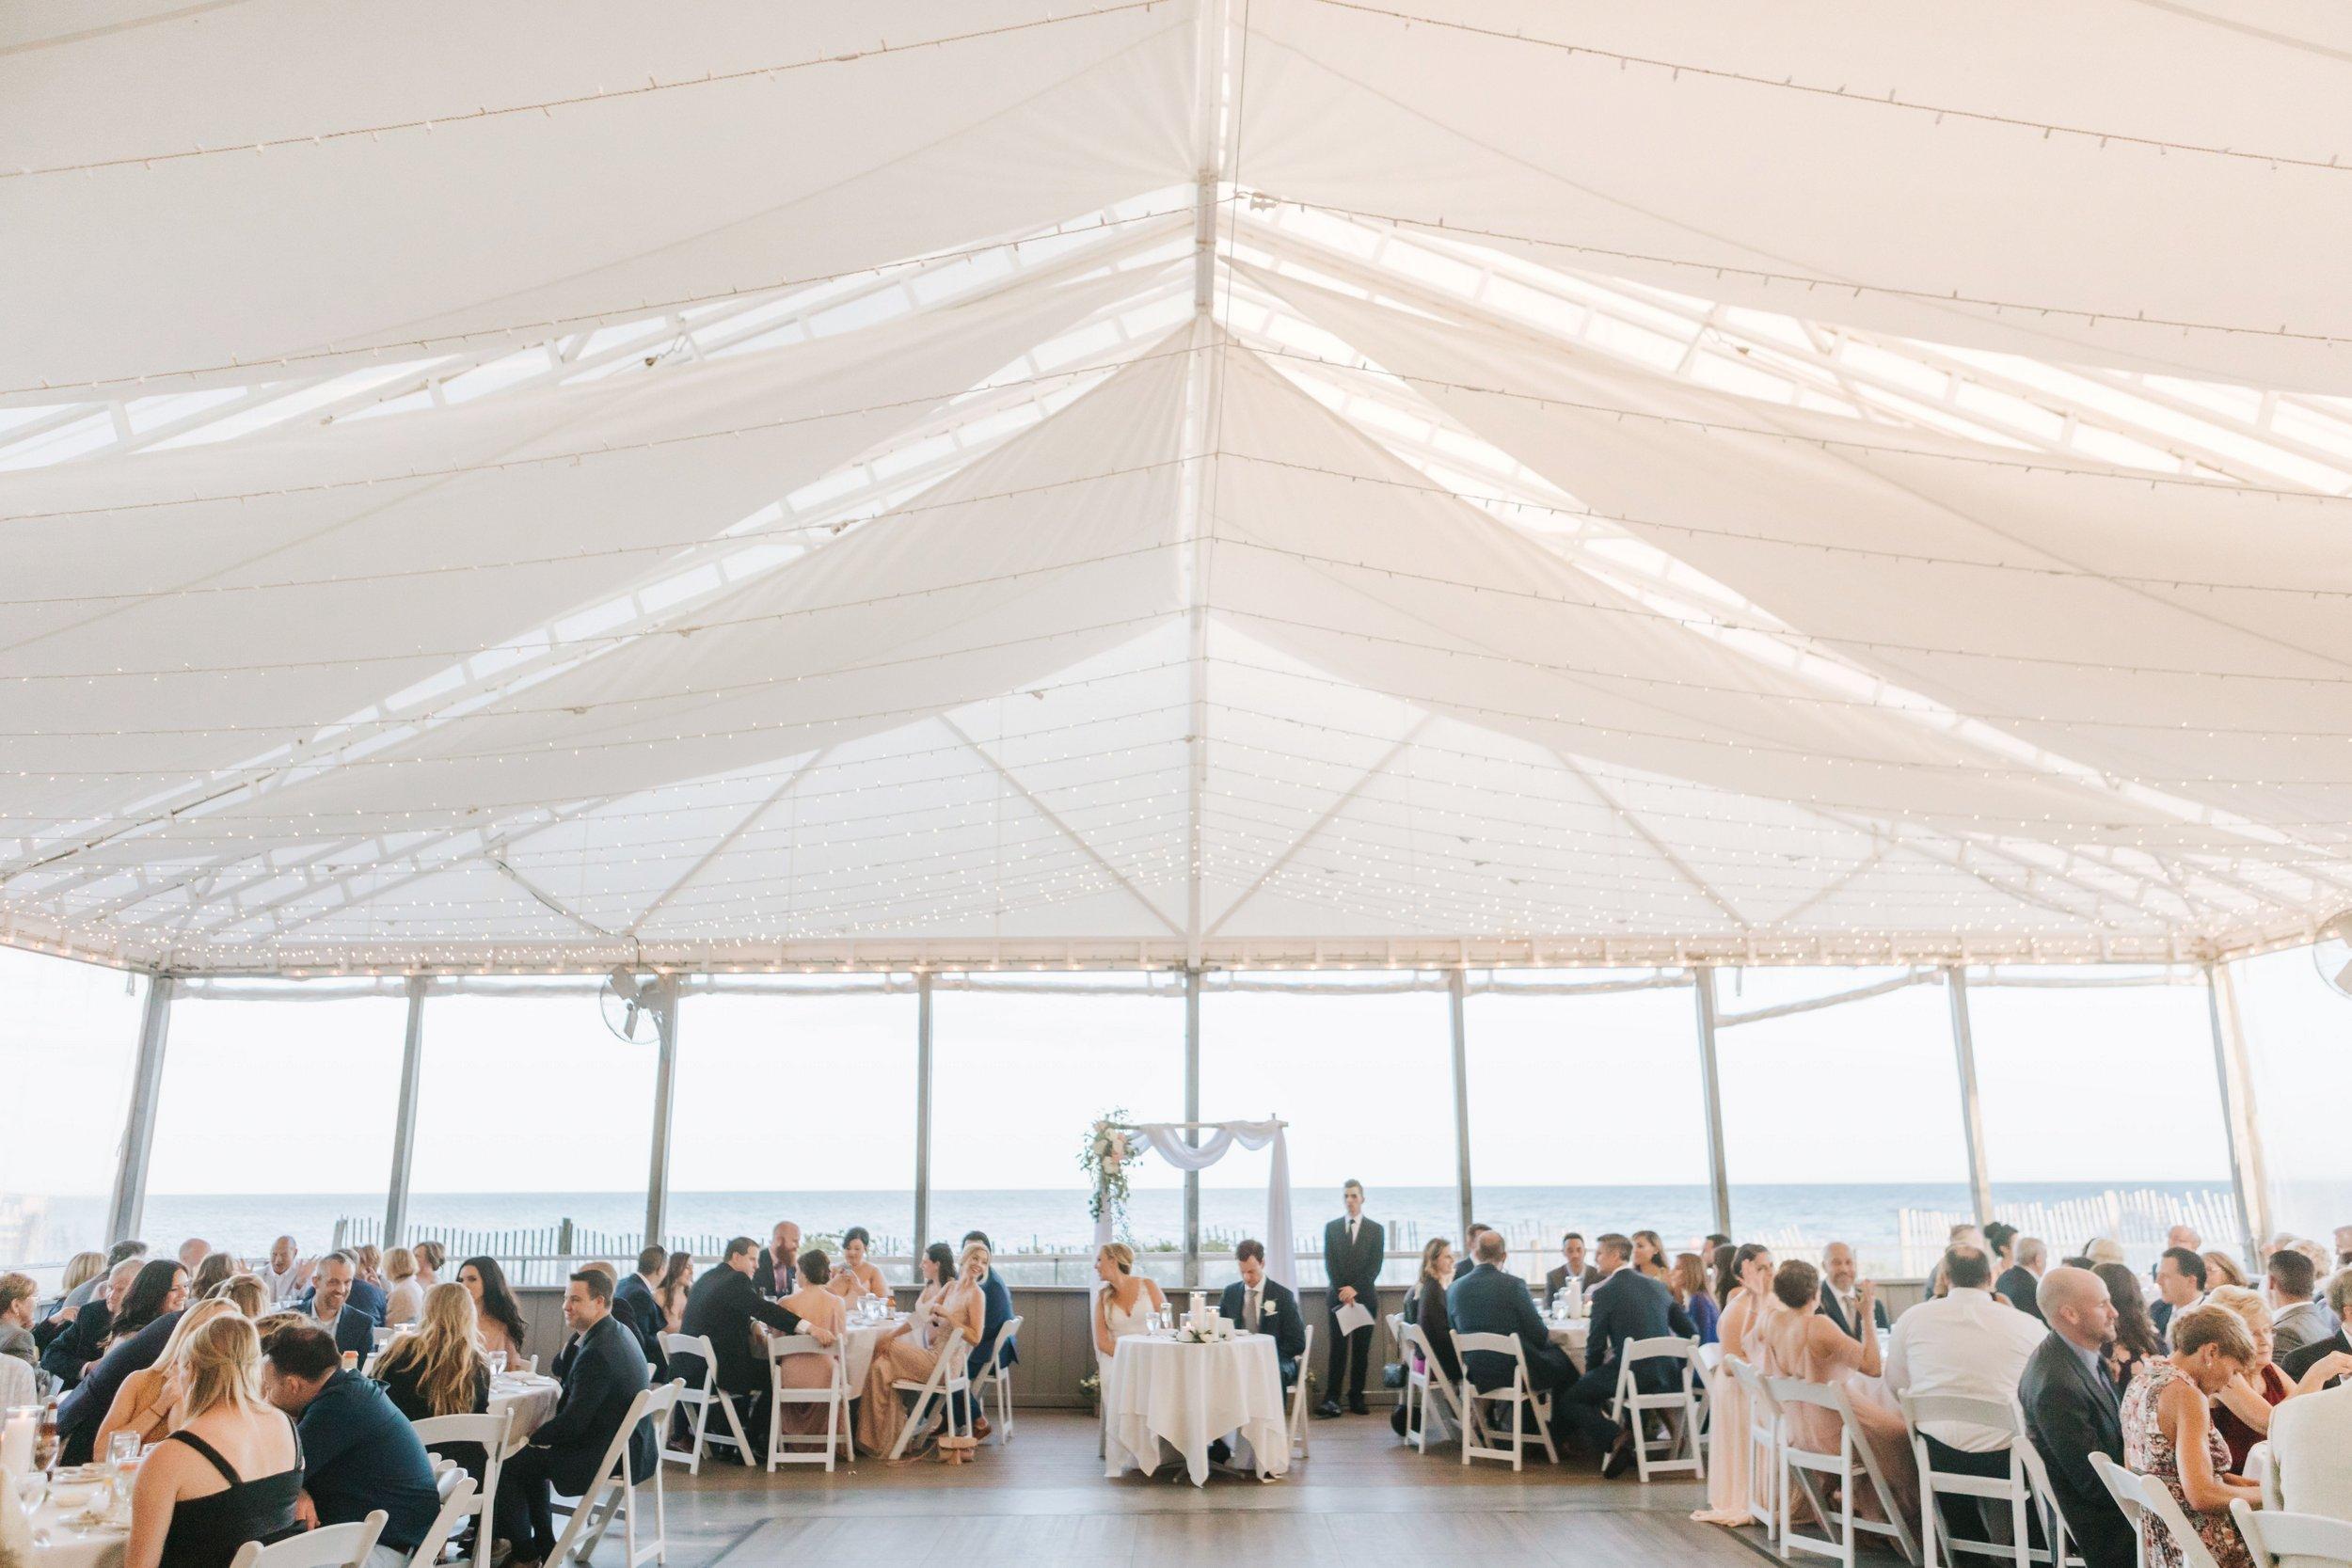 Popponesset-Inn-Wedding-Cape-Cod-Lena-Mirisola-Photography-44.jpg